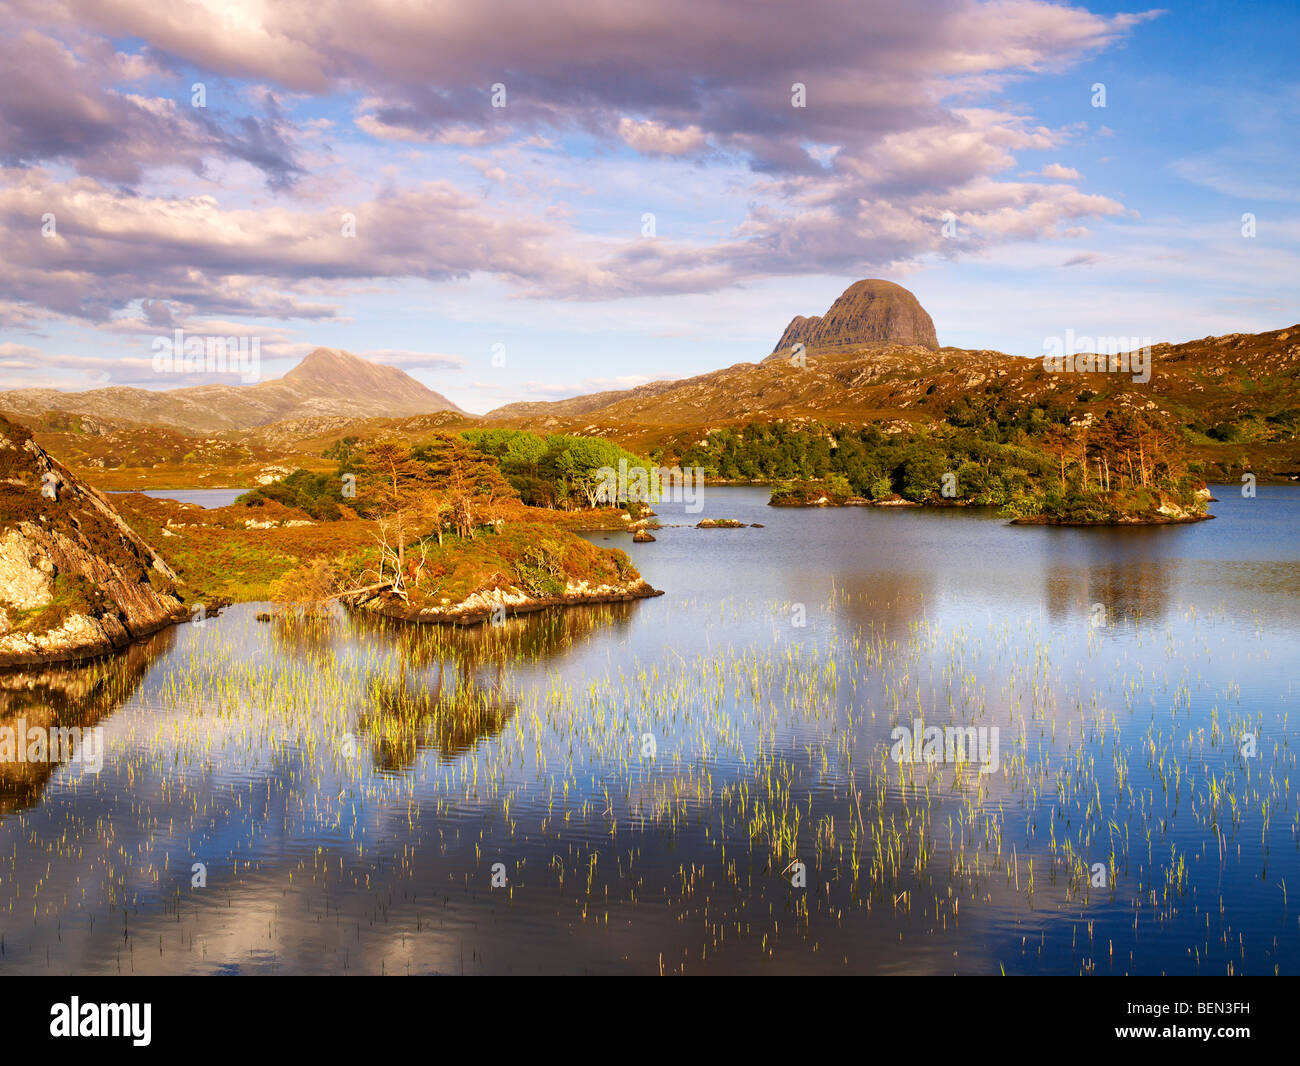 Scotland, Sutherland, Loch Druim Suardalain, Canisp (L) & Suilven (R) Stock Photo